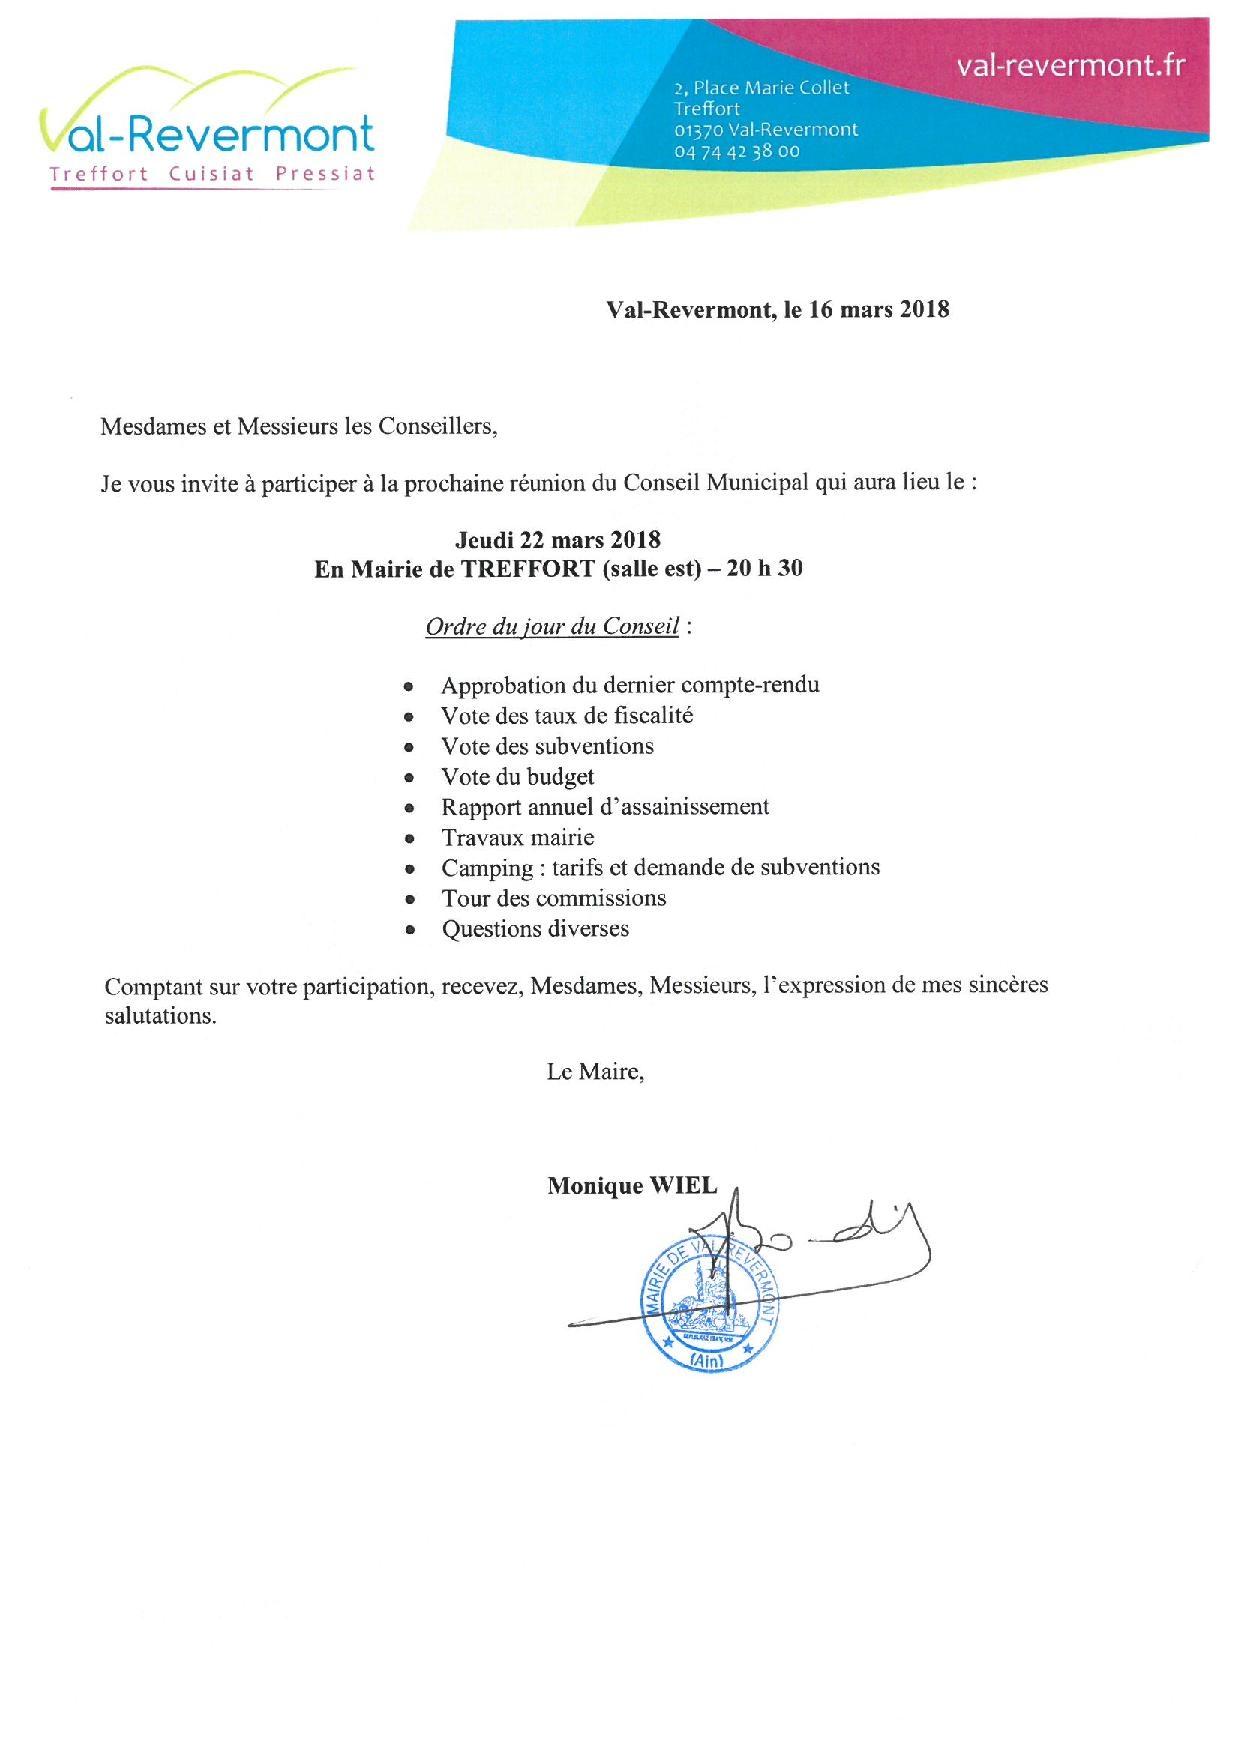 convocation CM 22 mars 2018